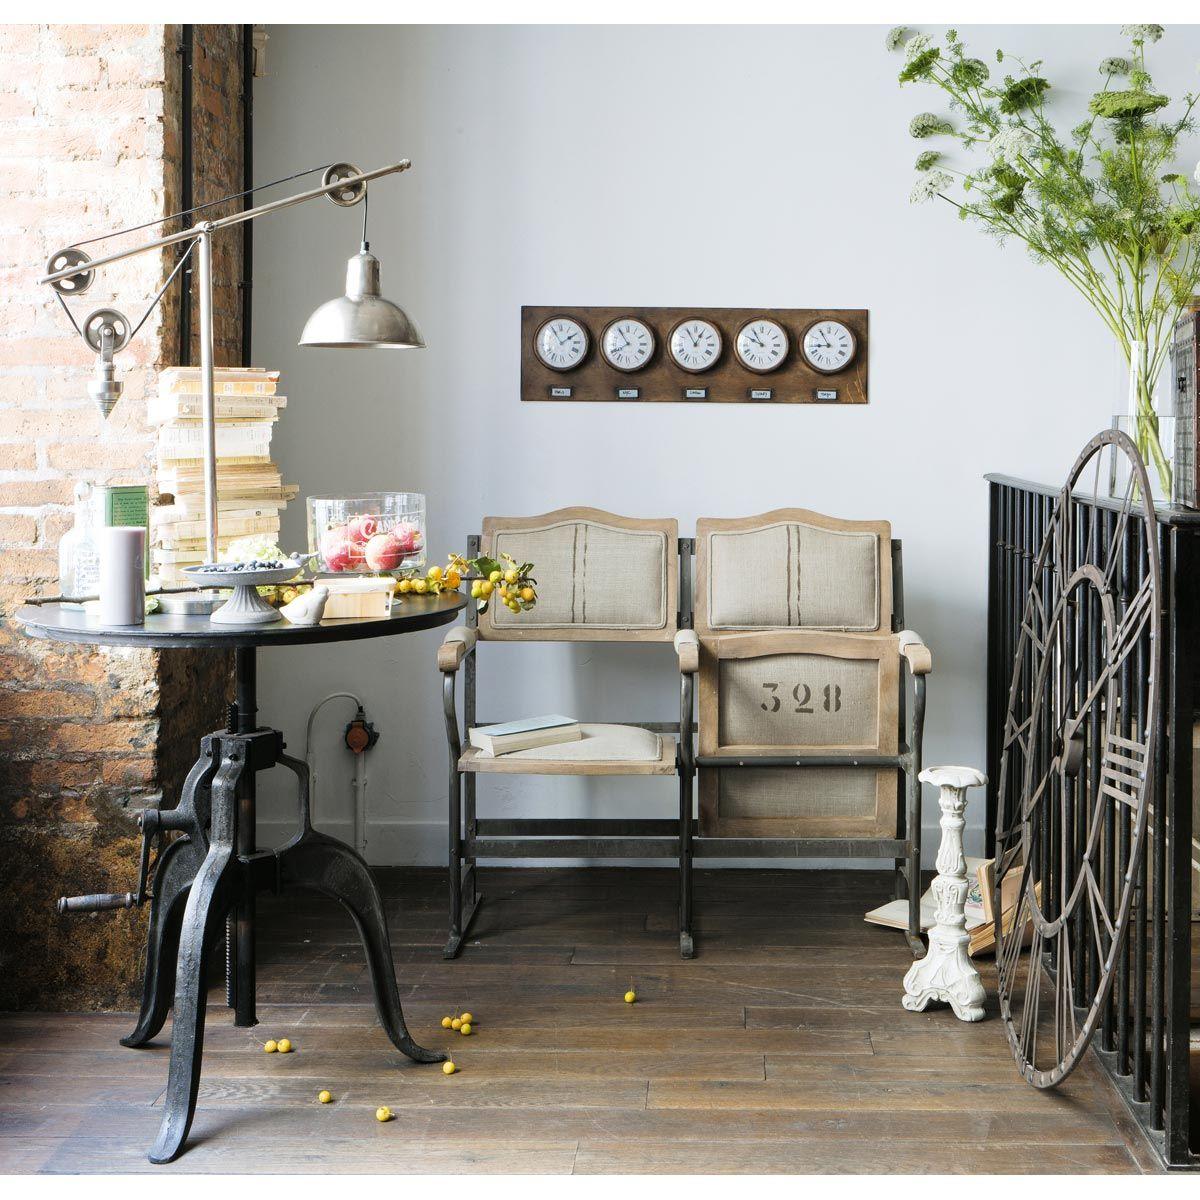 garderoben m bel industrial garderobe rohre swalif. Black Bedroom Furniture Sets. Home Design Ideas